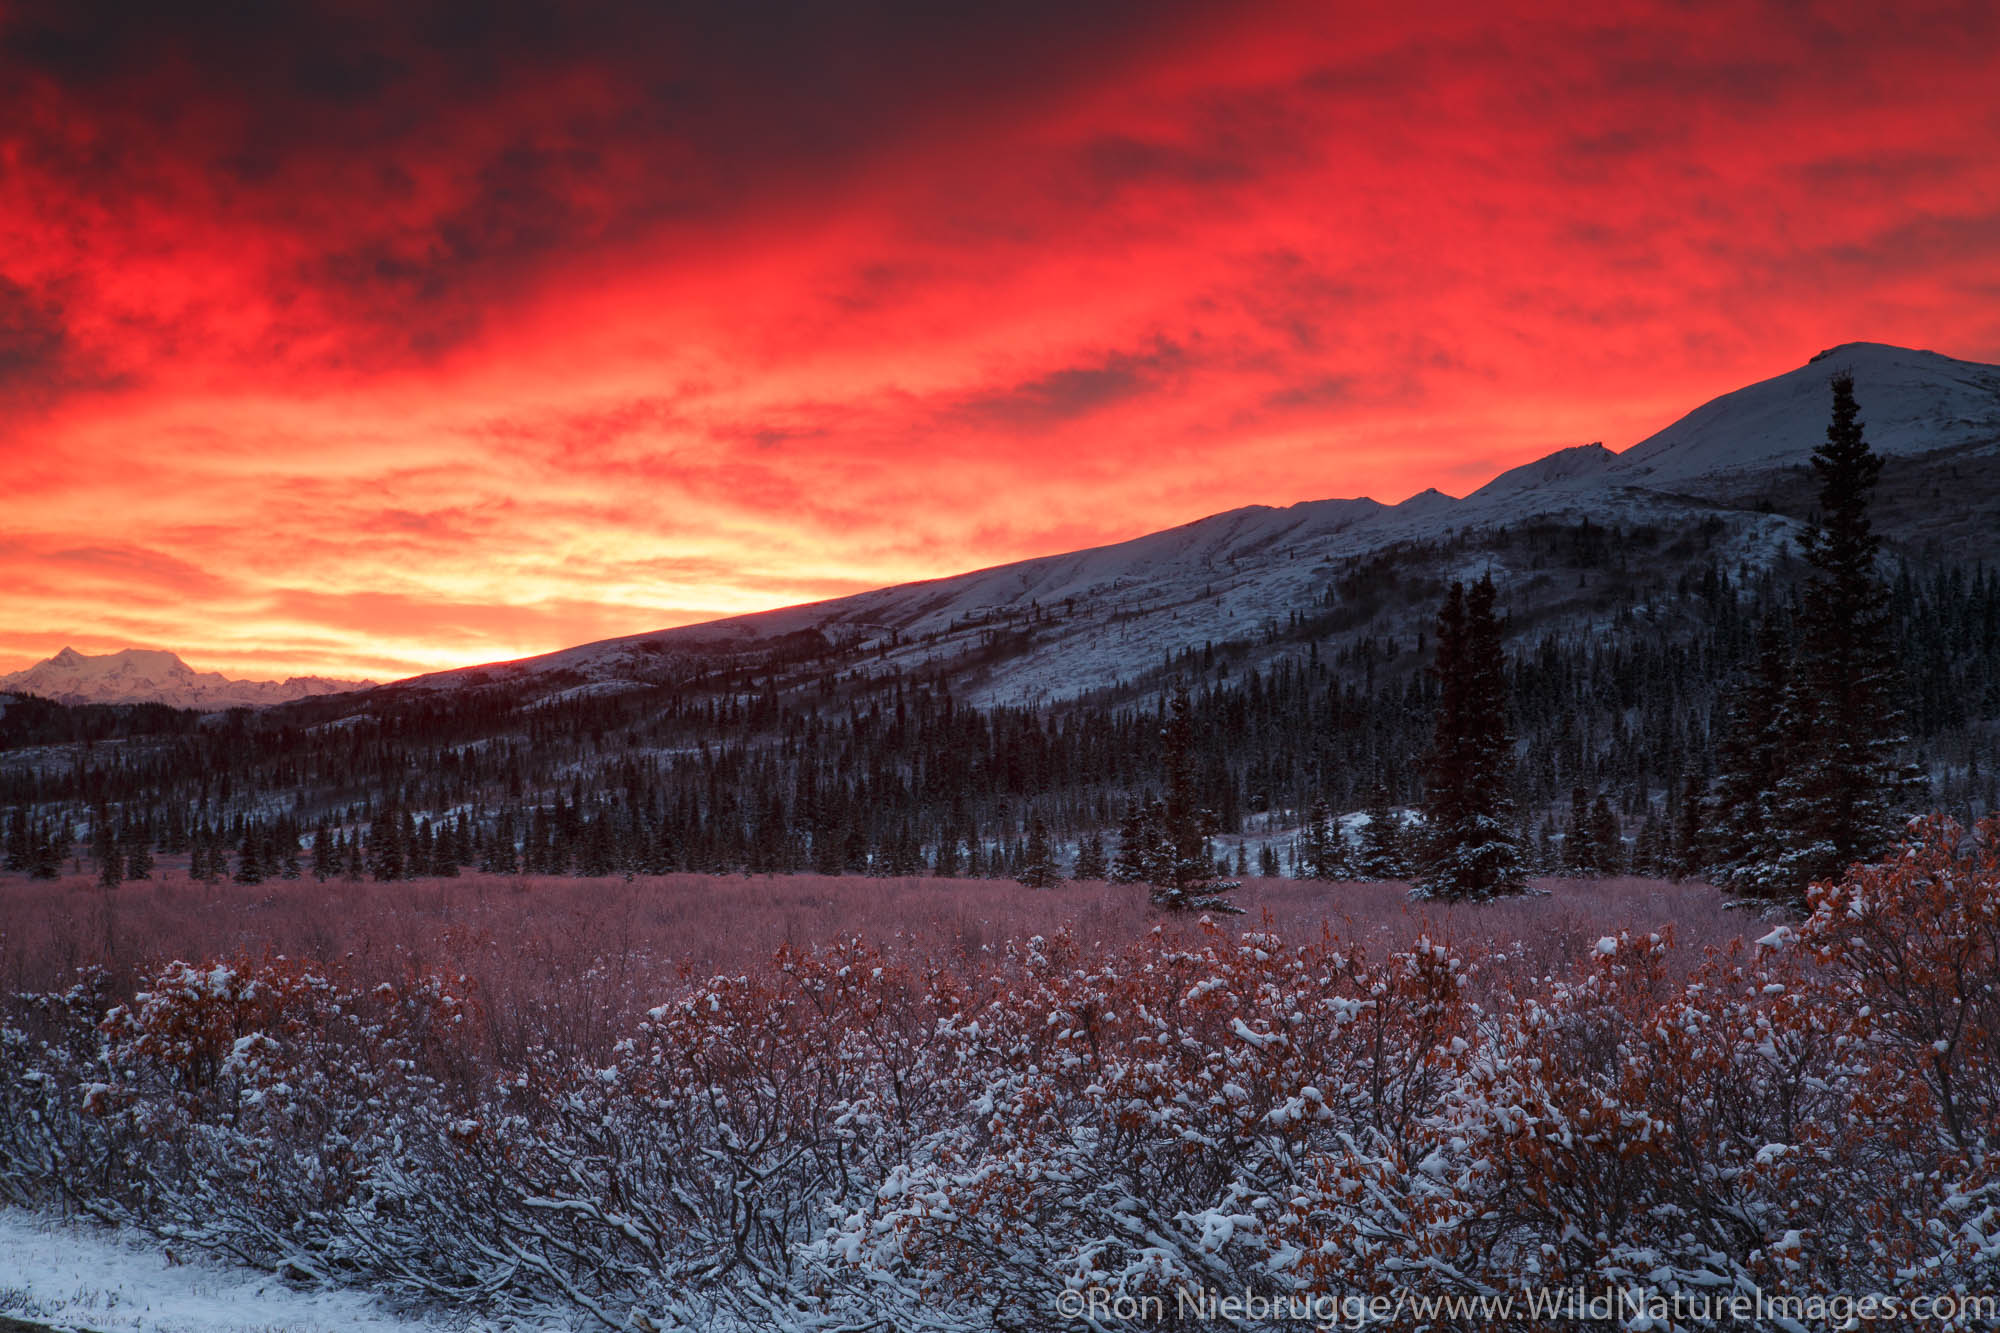 Sunrise over Denali National Park, Alaska.